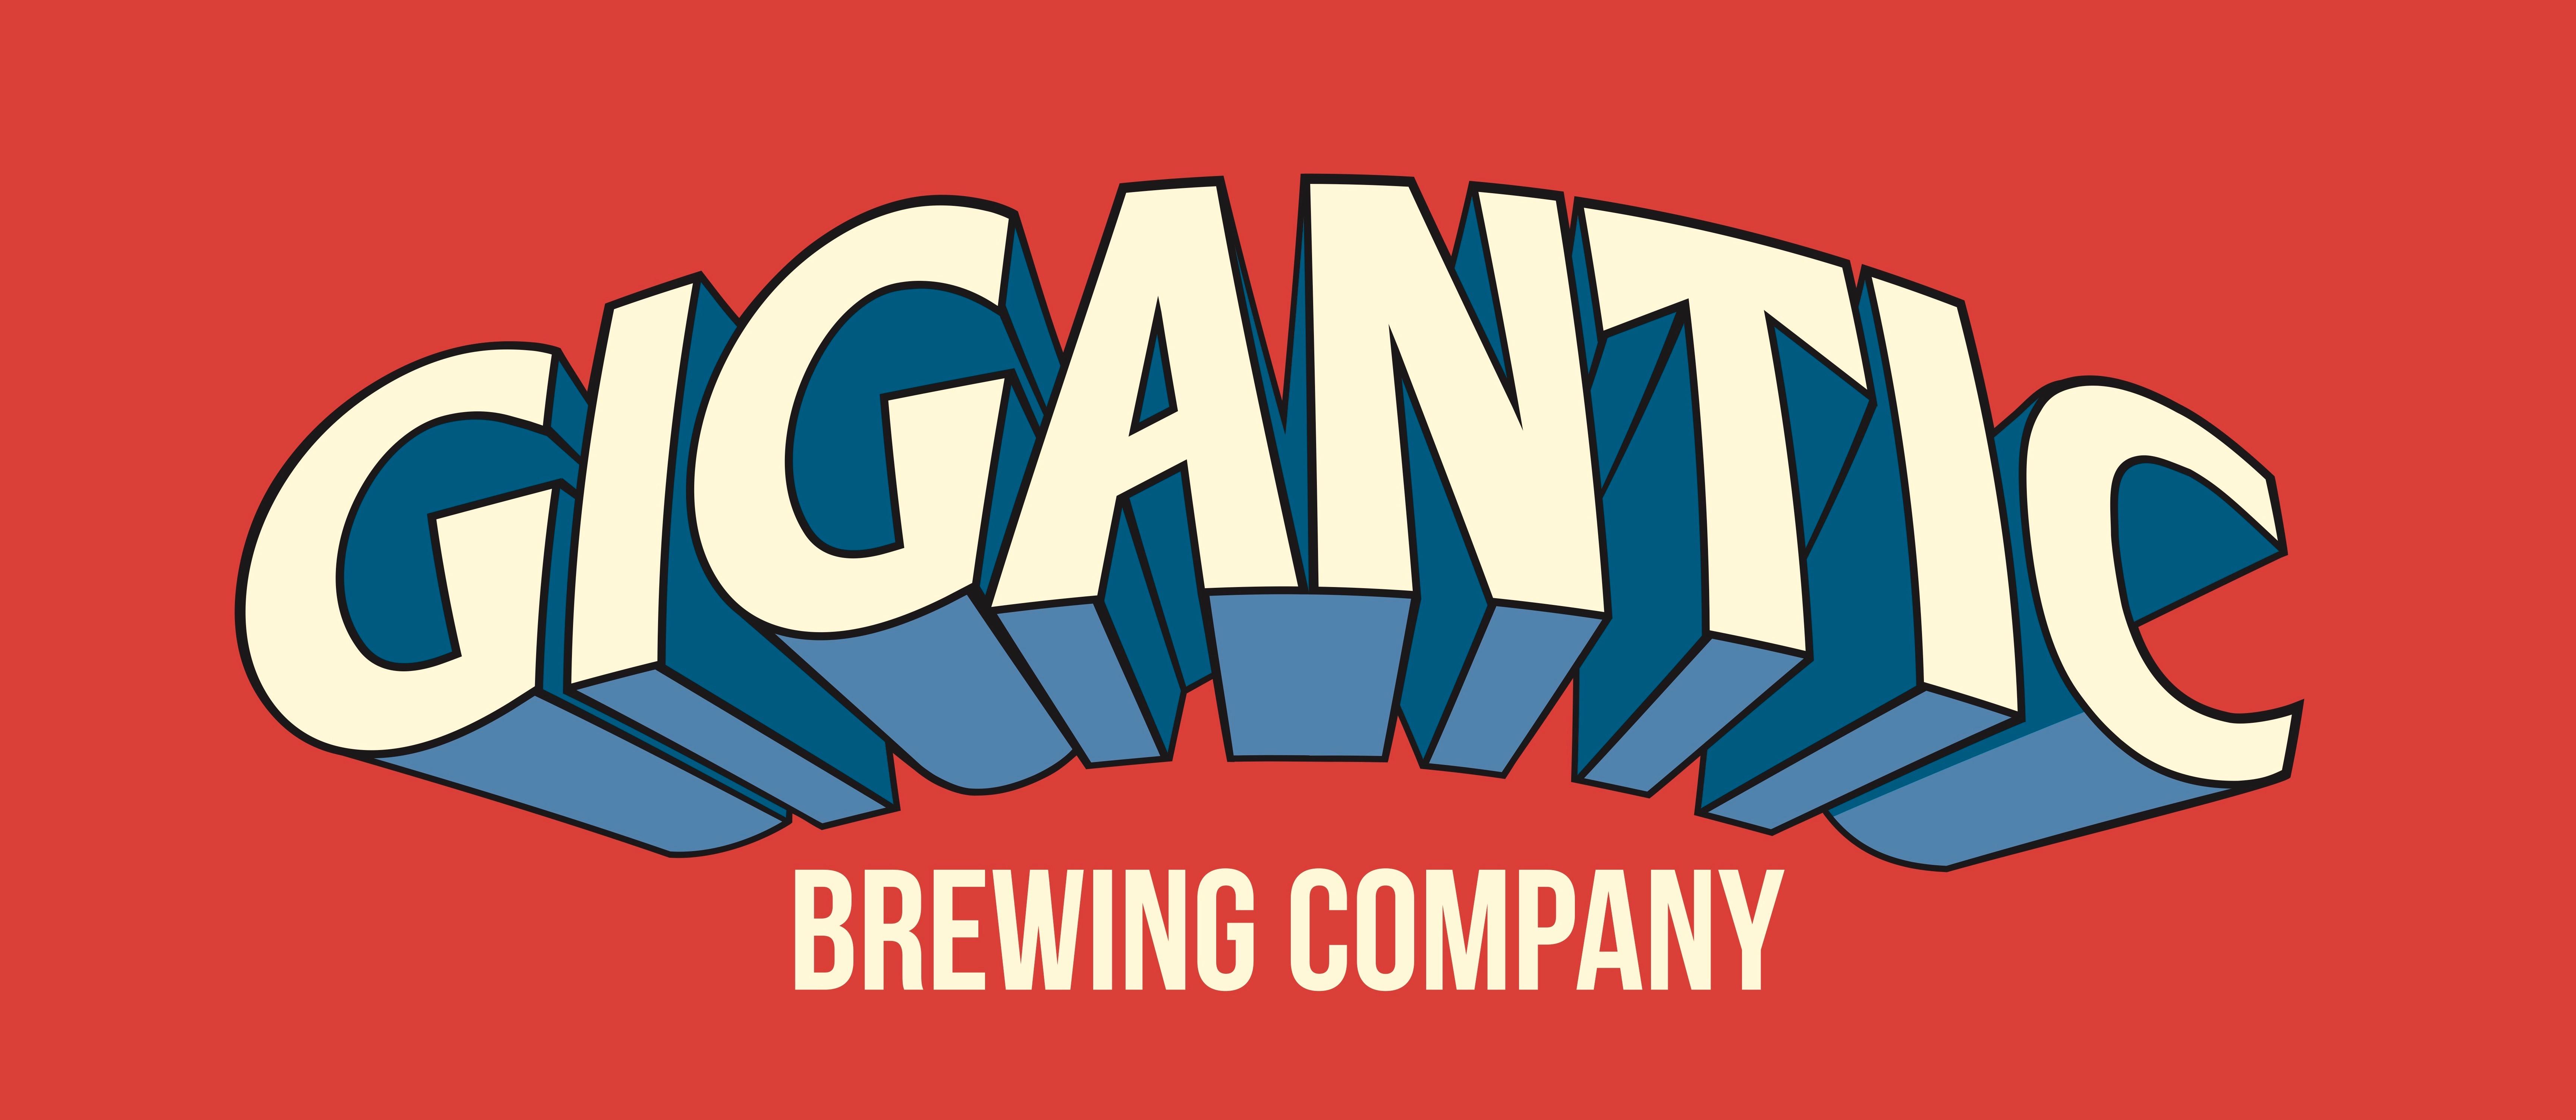 Gigantic logo blue on red